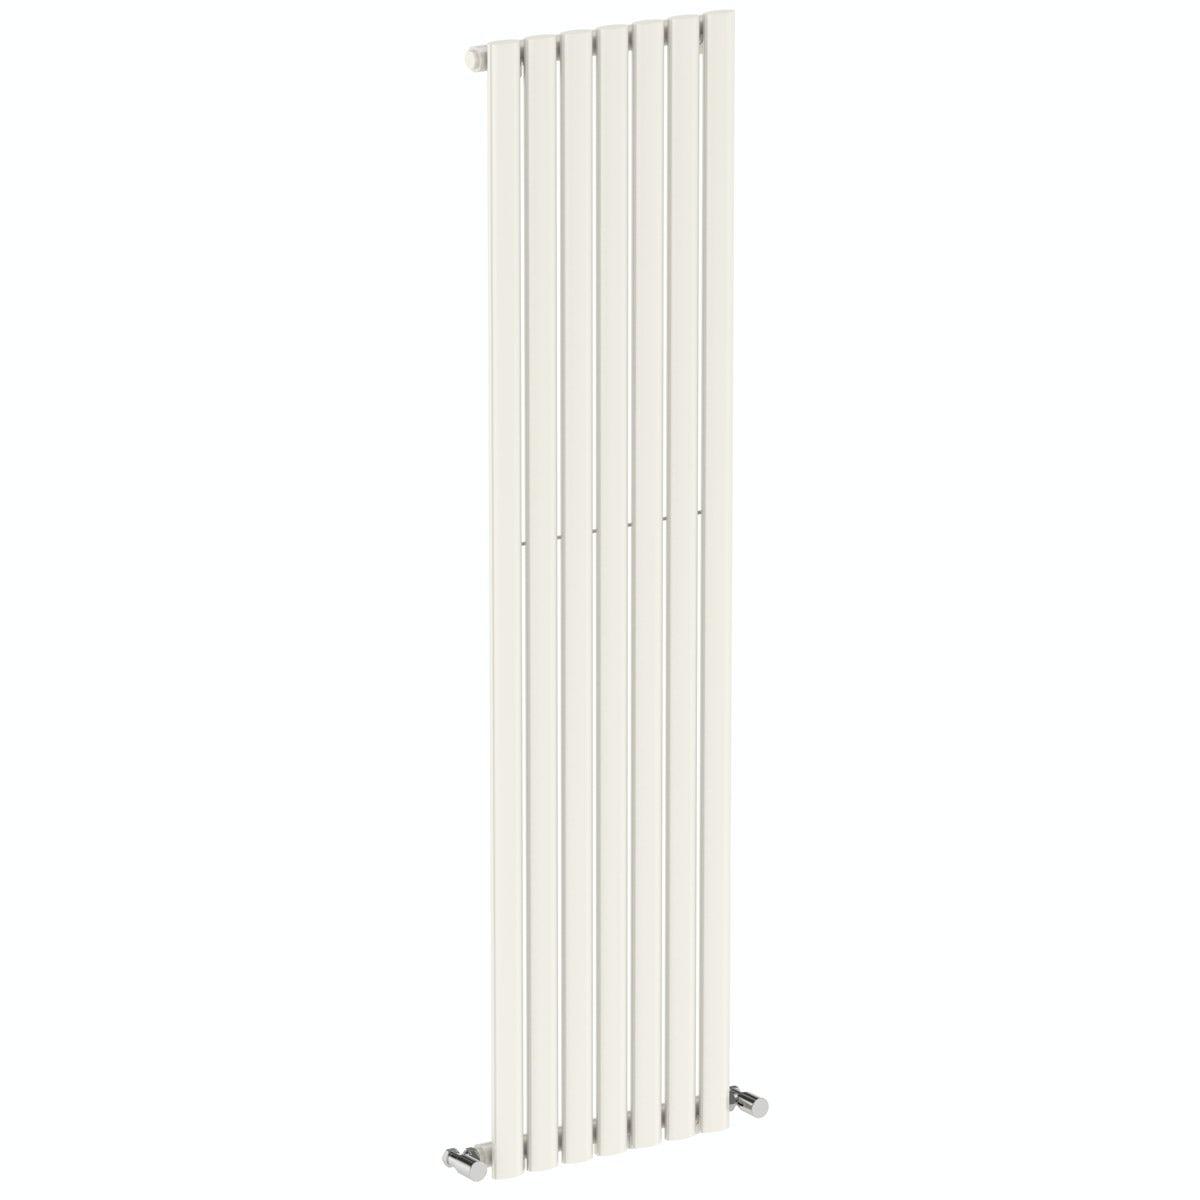 Tate white single vertical radiator 1600 x 406